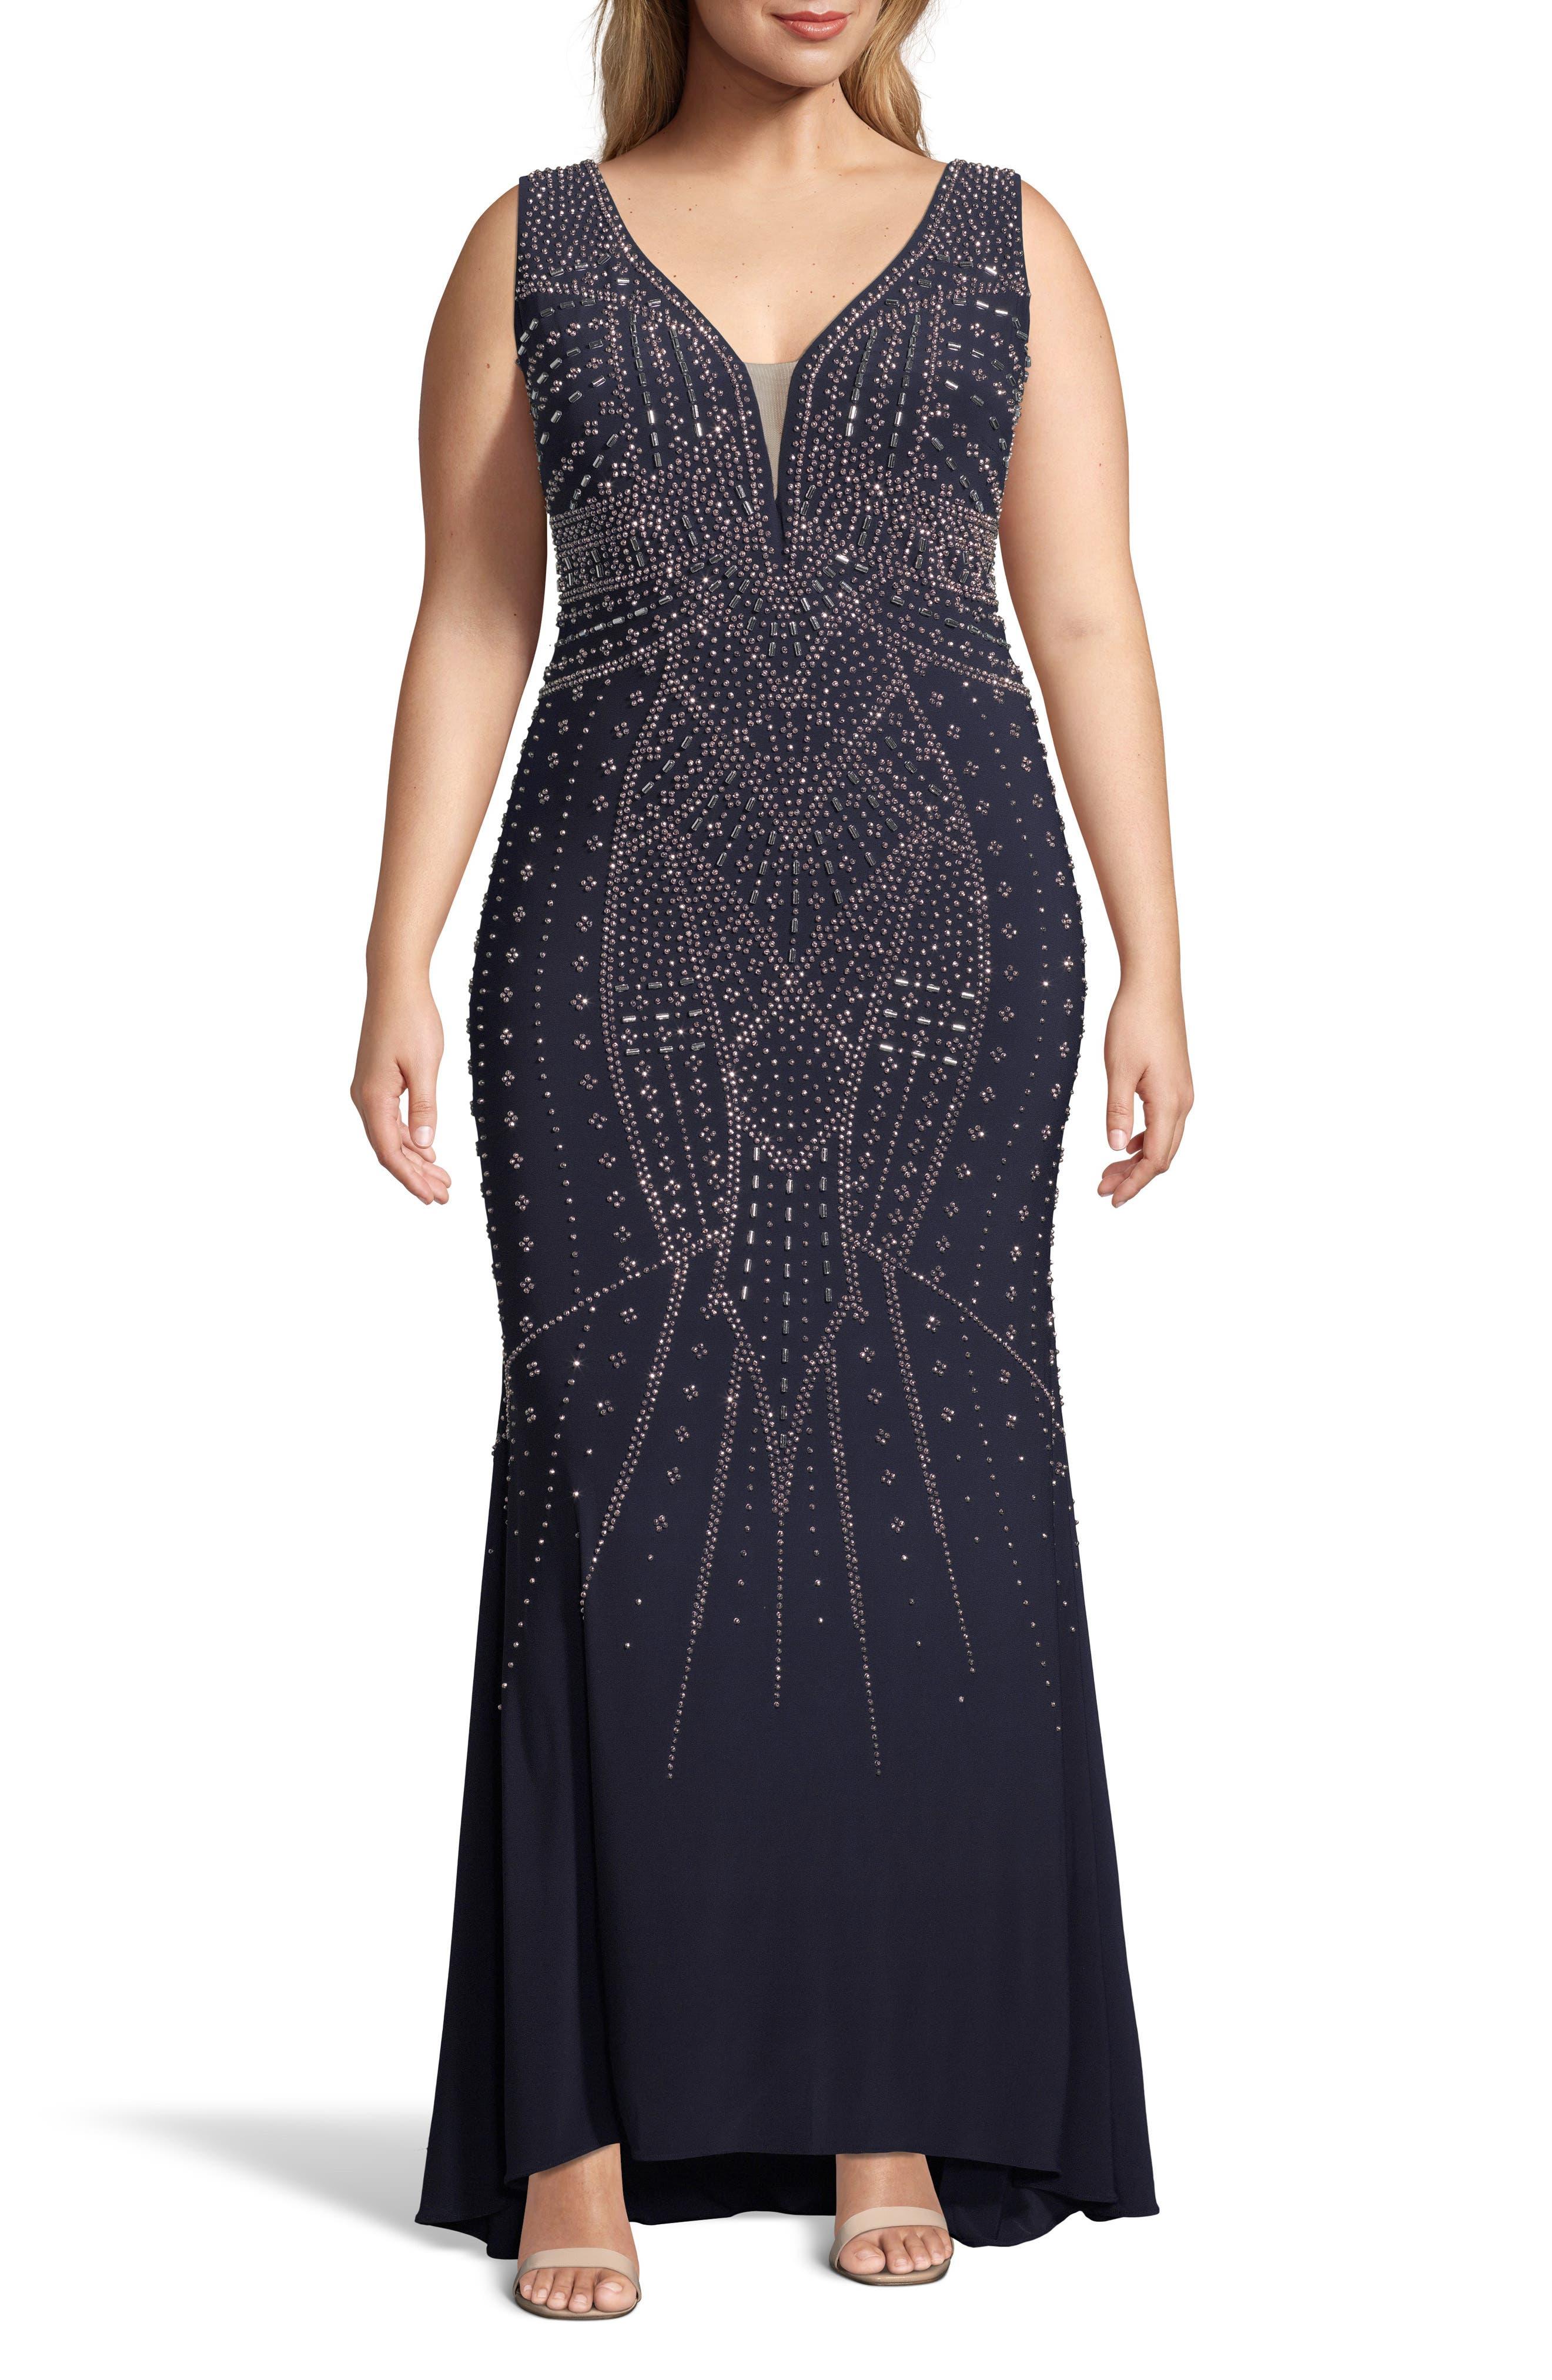 Xscape Blue Beaded Dress